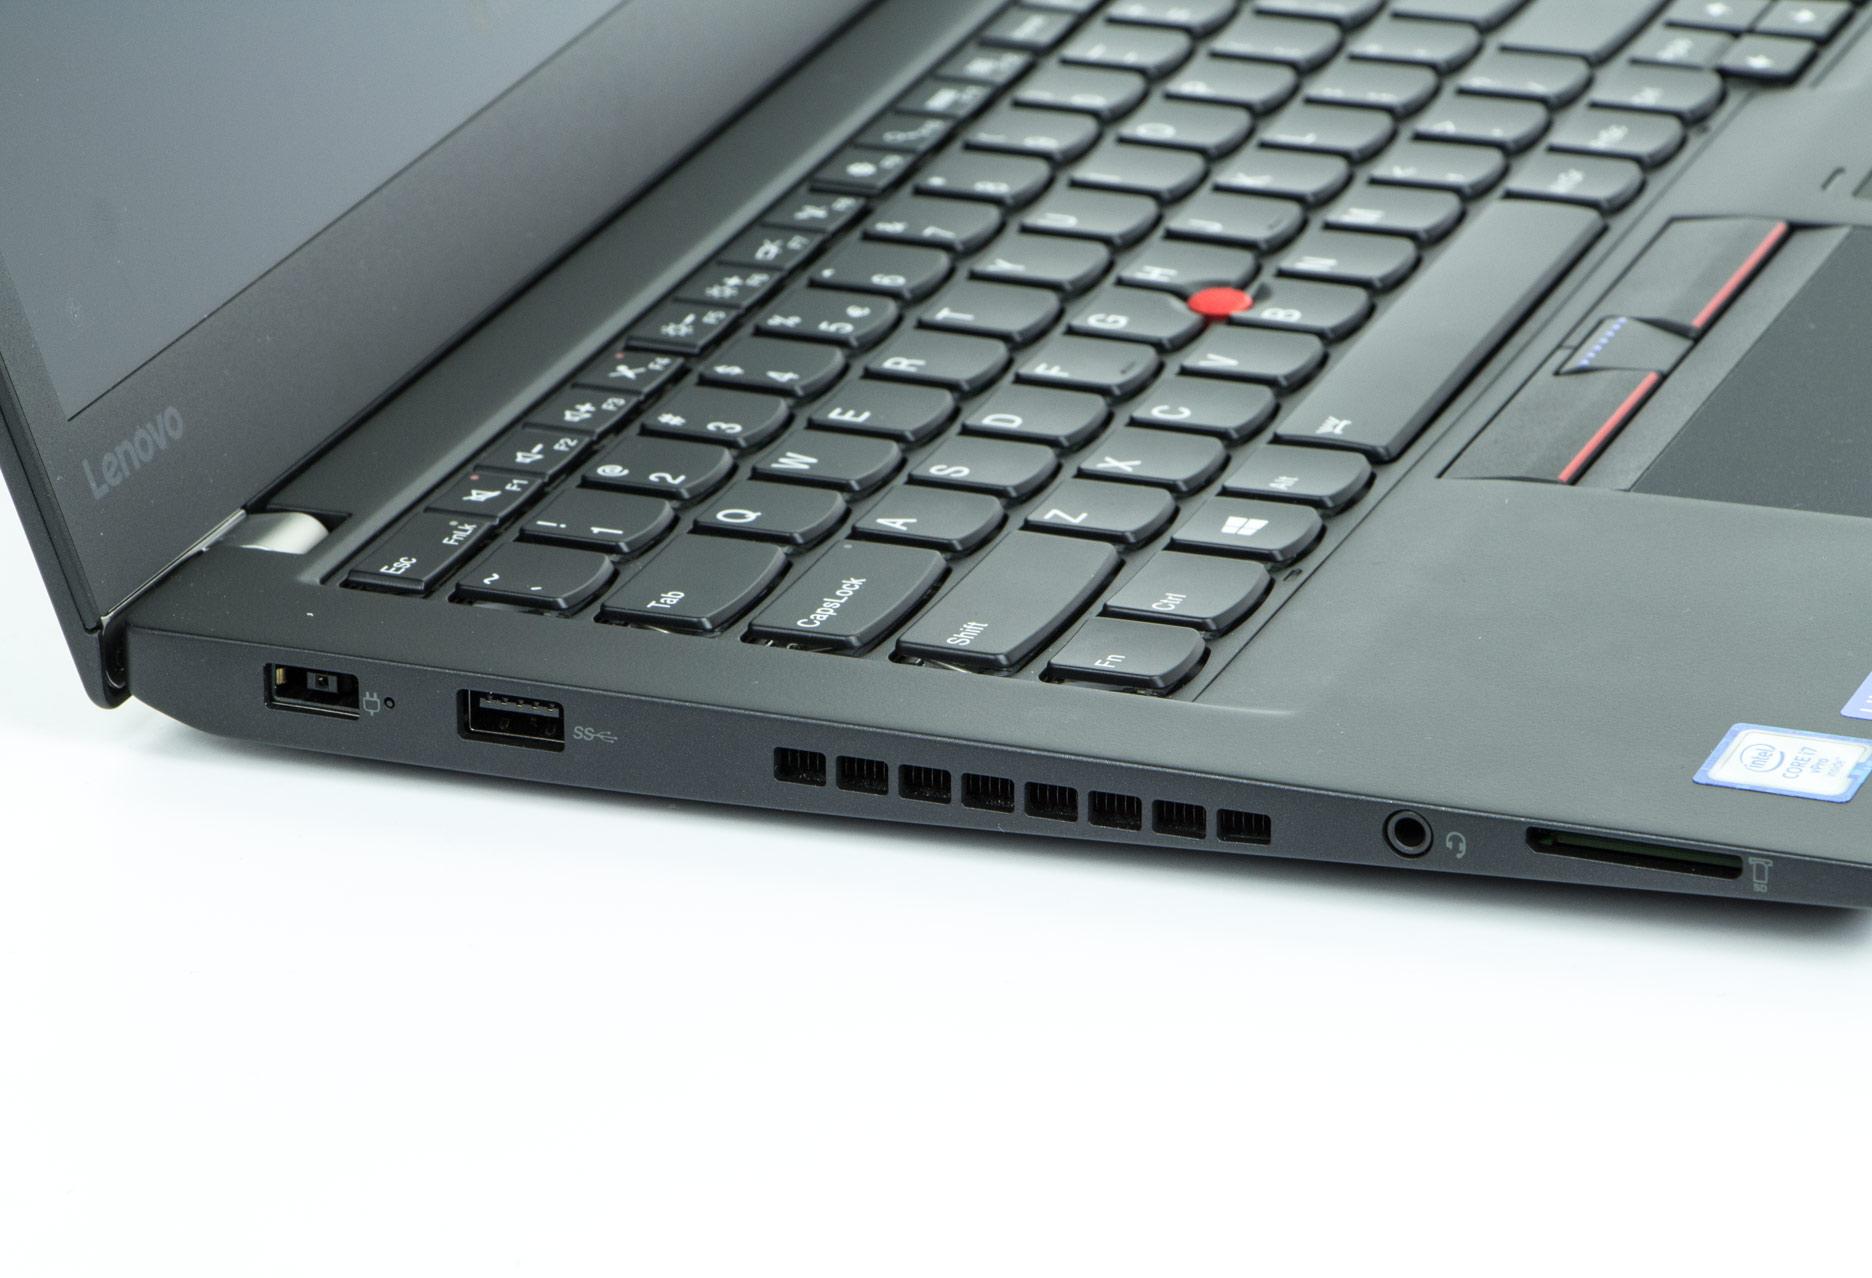 Lenovo ThinkPad T460s lewy bok